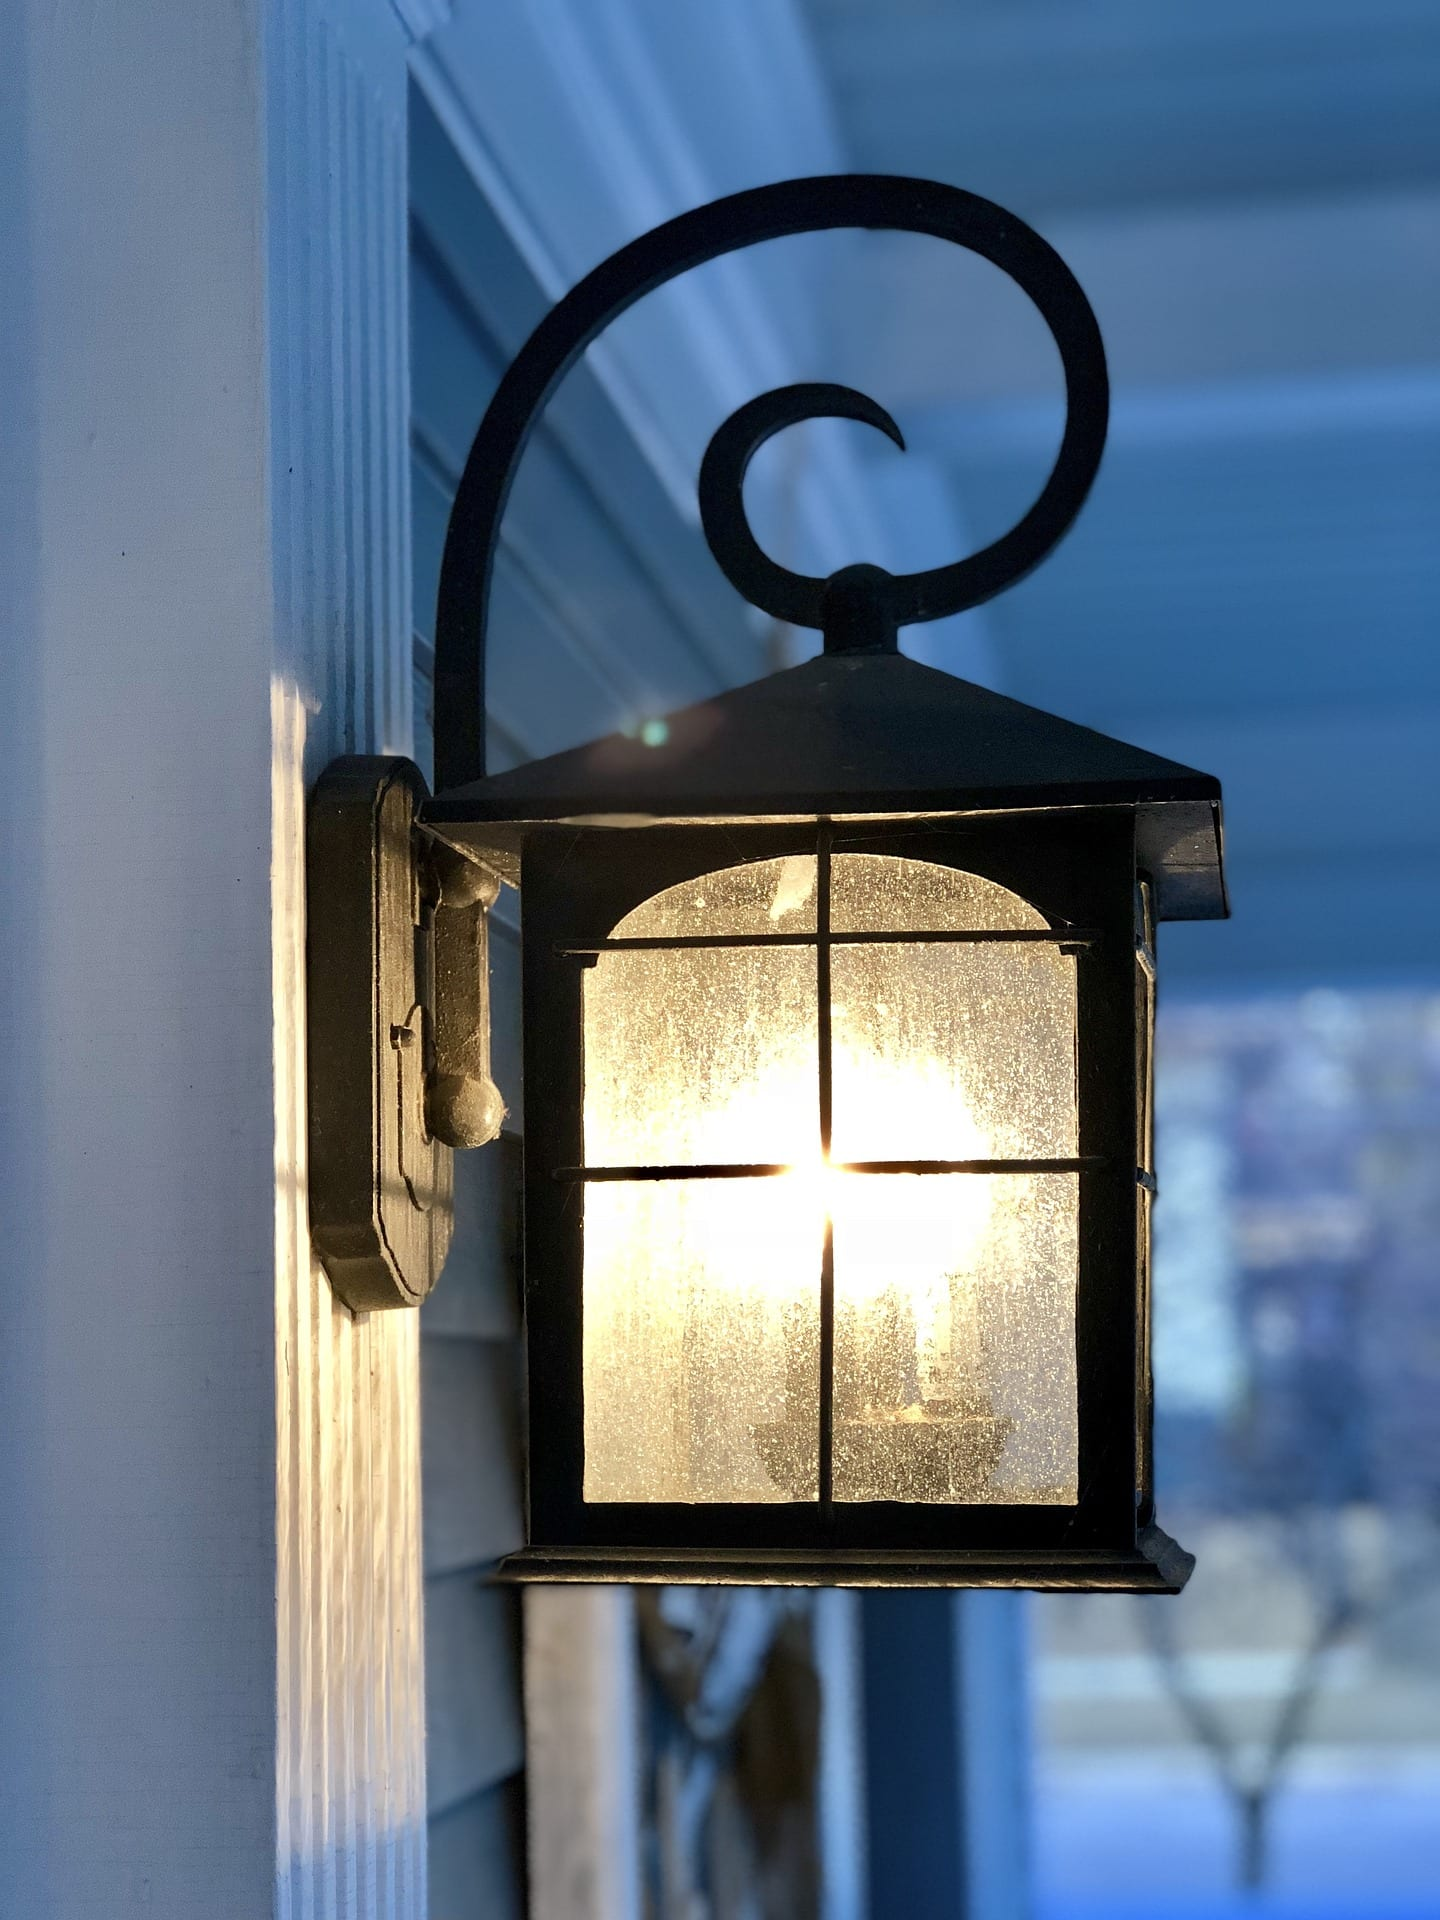 Can I Use Indoor Lighting Fixtures Outdoors